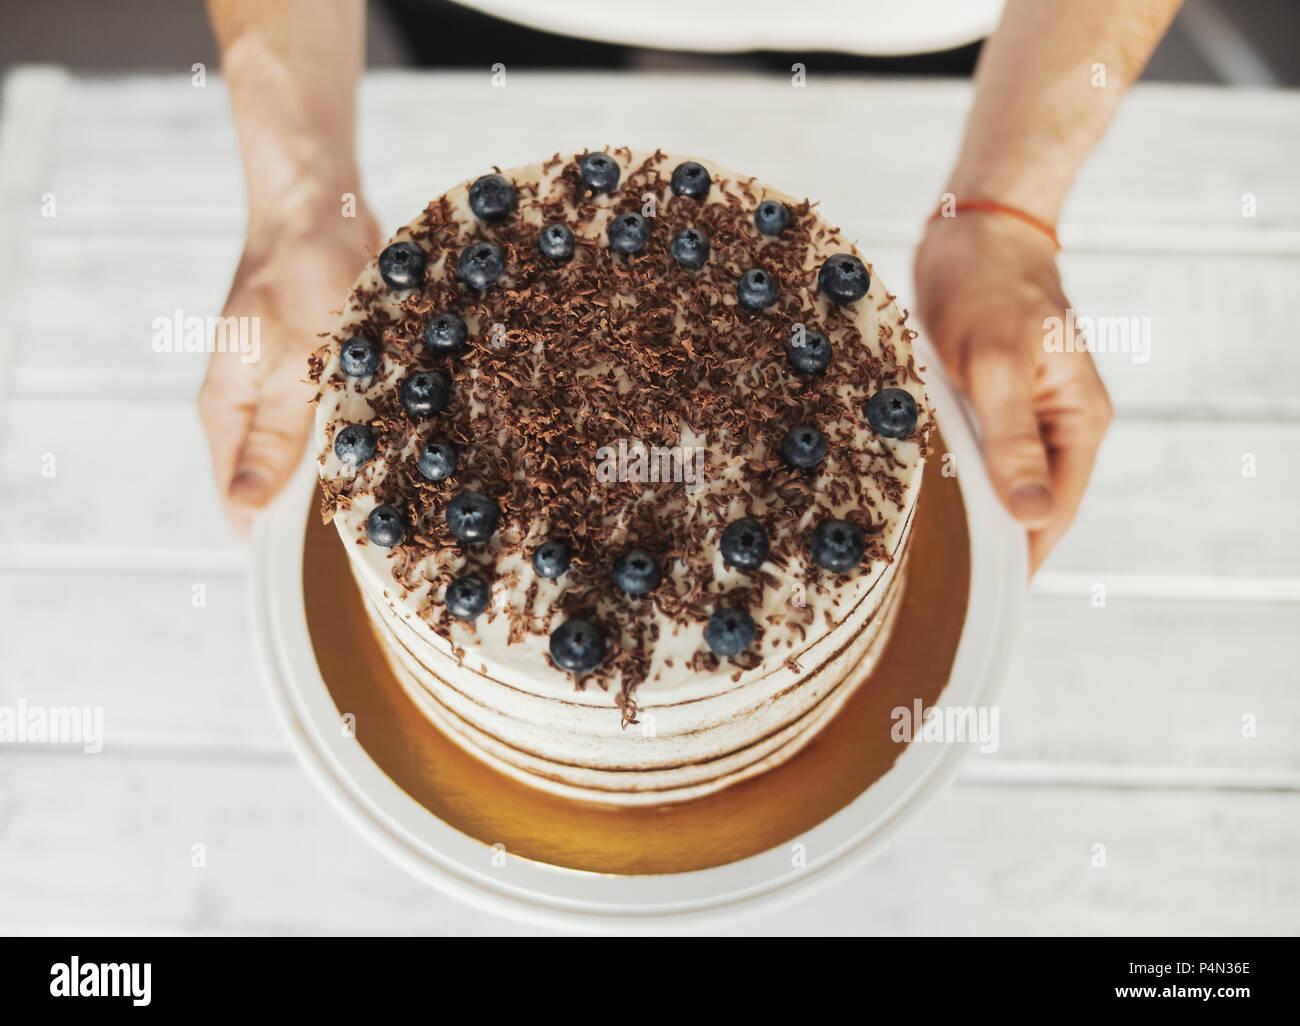 Young woman decorating cake au chocolat et fruits rouges Photo Stock